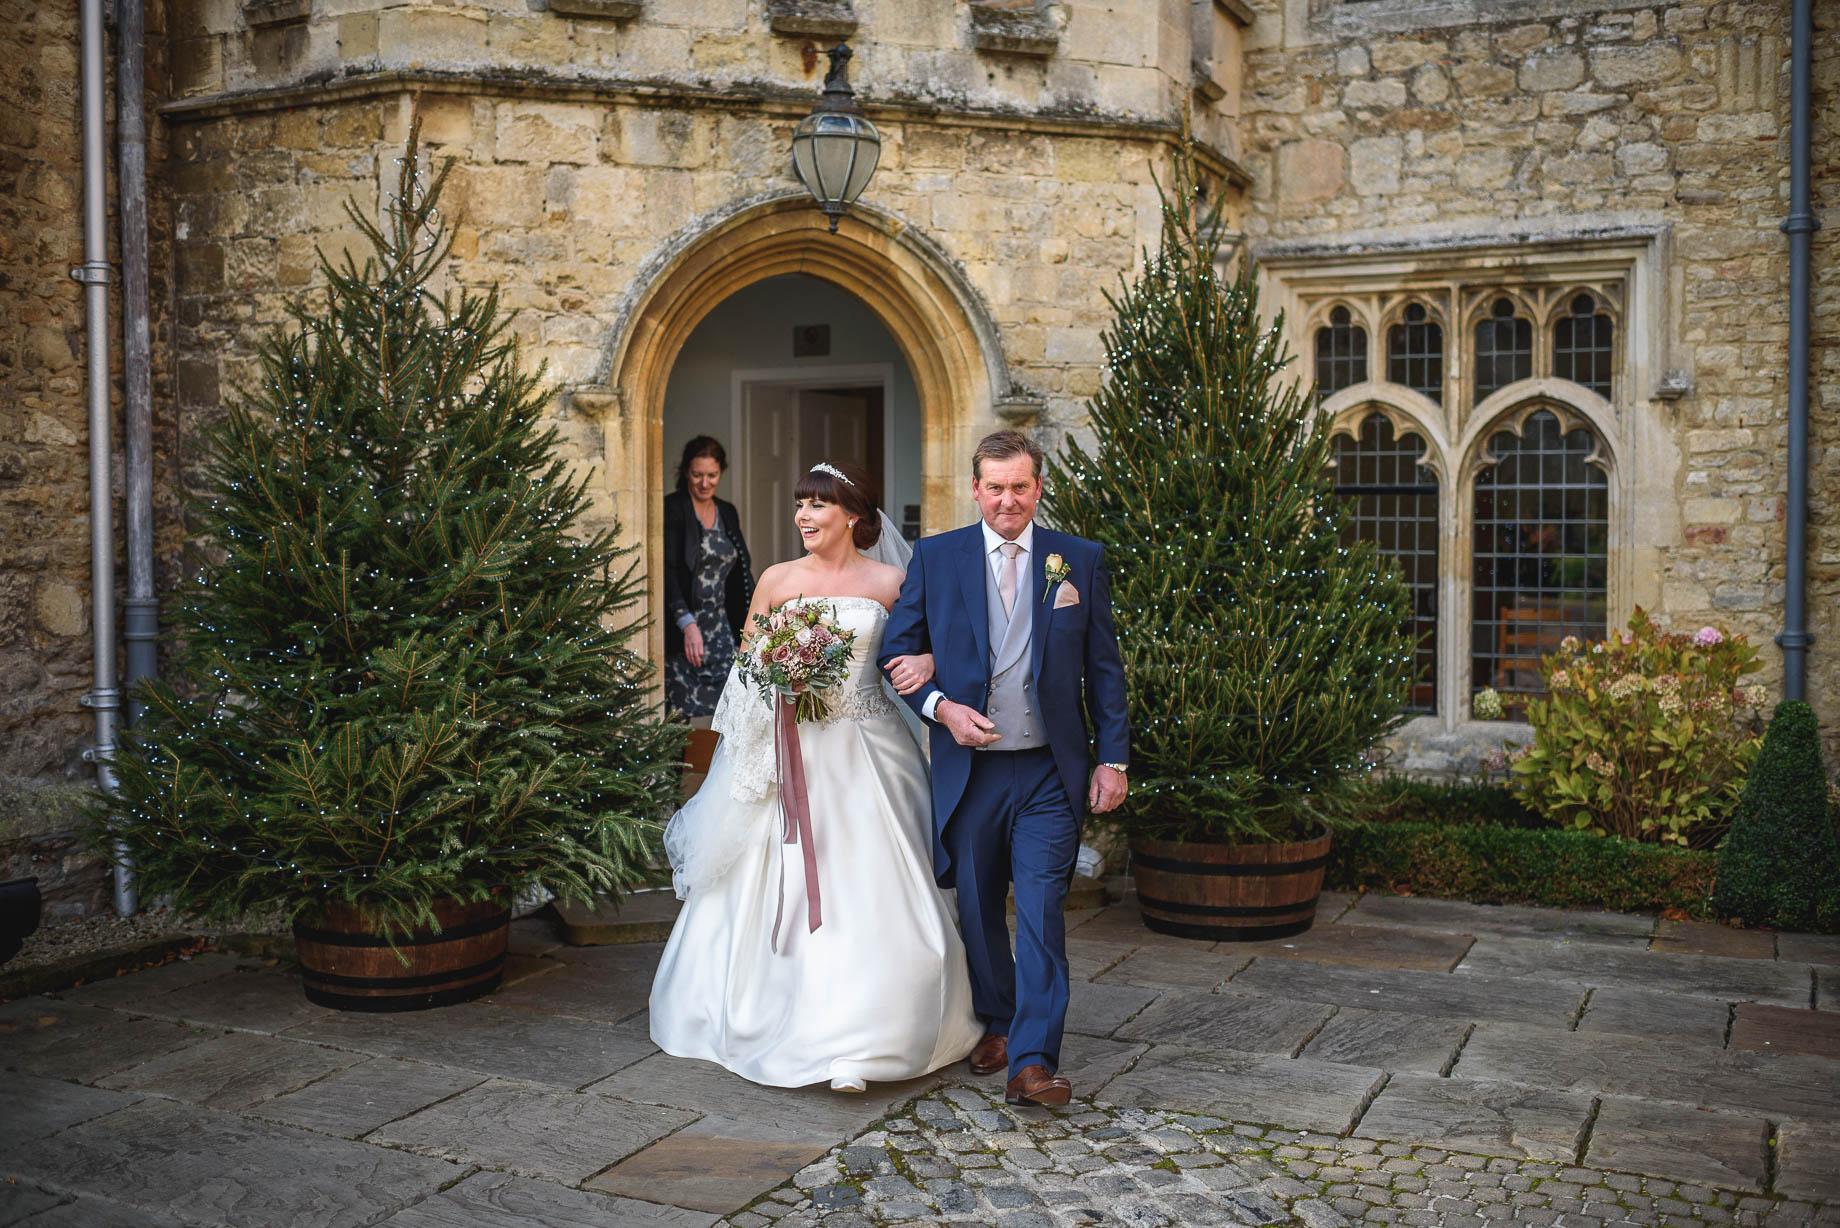 Notley Abbey wedding photography - Rachel + Seb